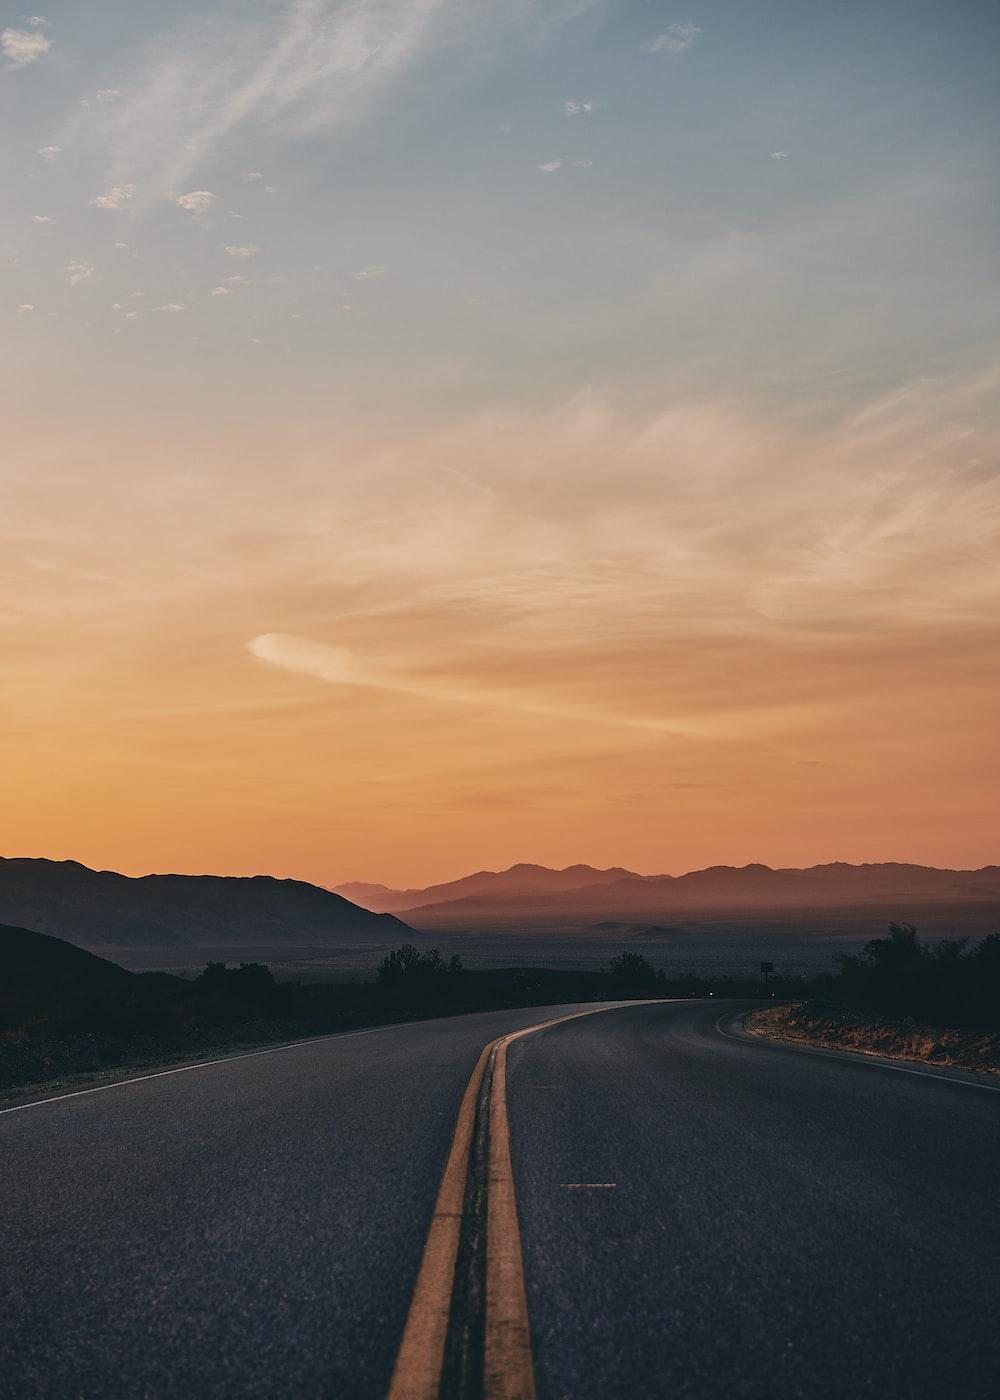 empty gray asphalt road